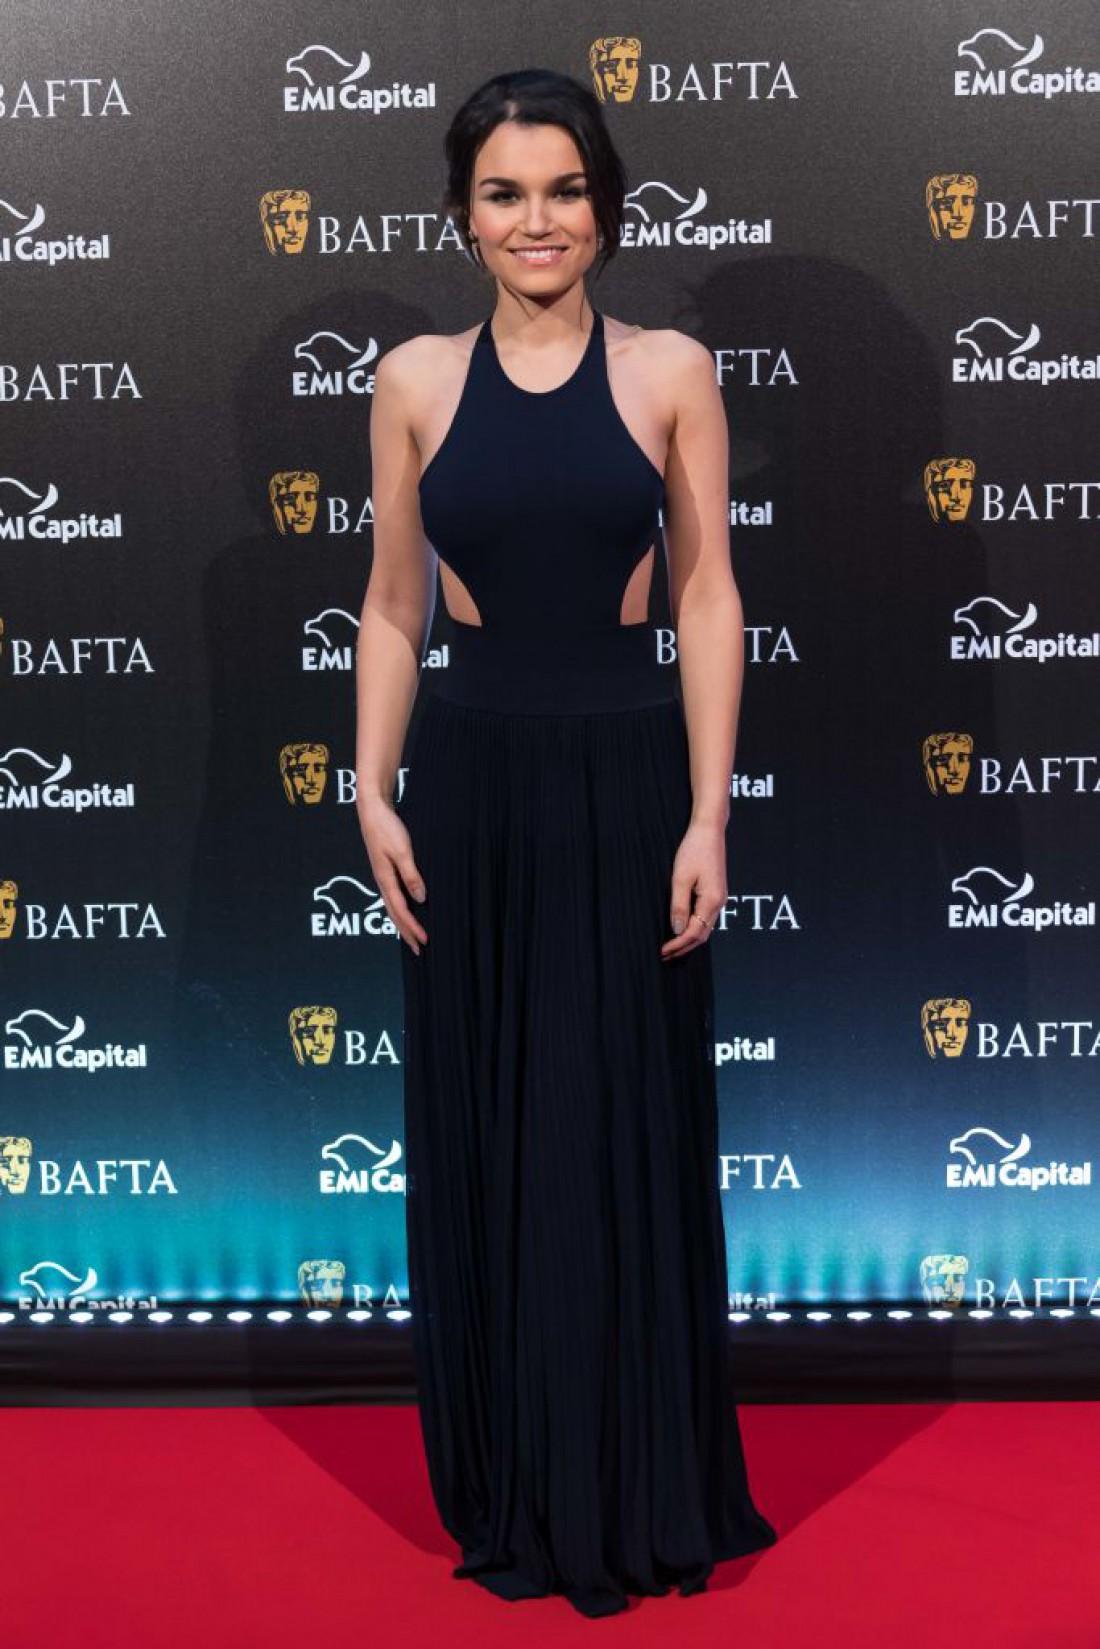 Саманта Баркс на премии BAFTA 2017